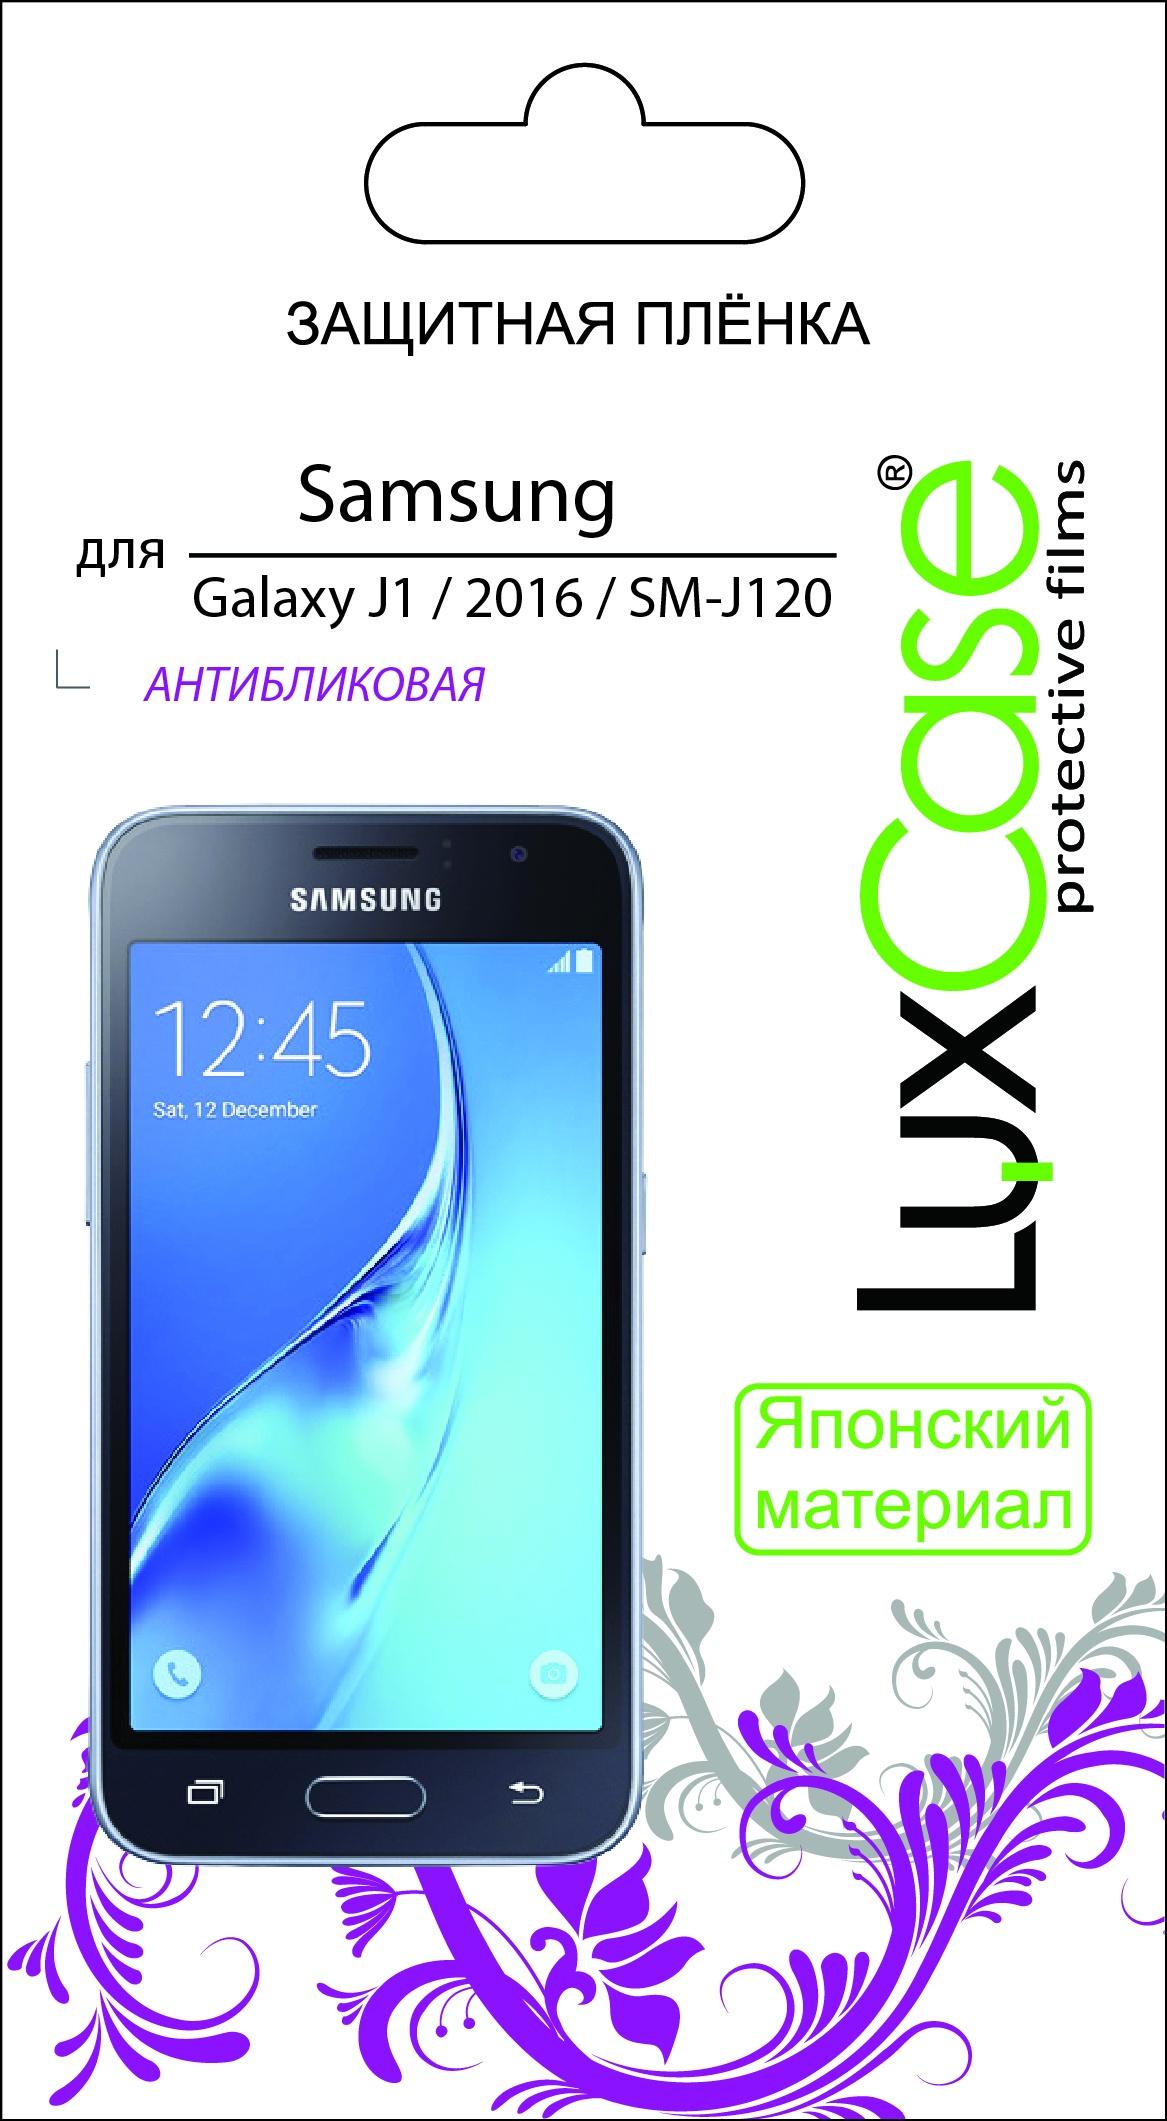 Пленка Samsung Galaxy J1 / 2016 / SM-J120 / антибликовая защитная пленка luxcase для samsung galaxy j1 2016 глянцевая